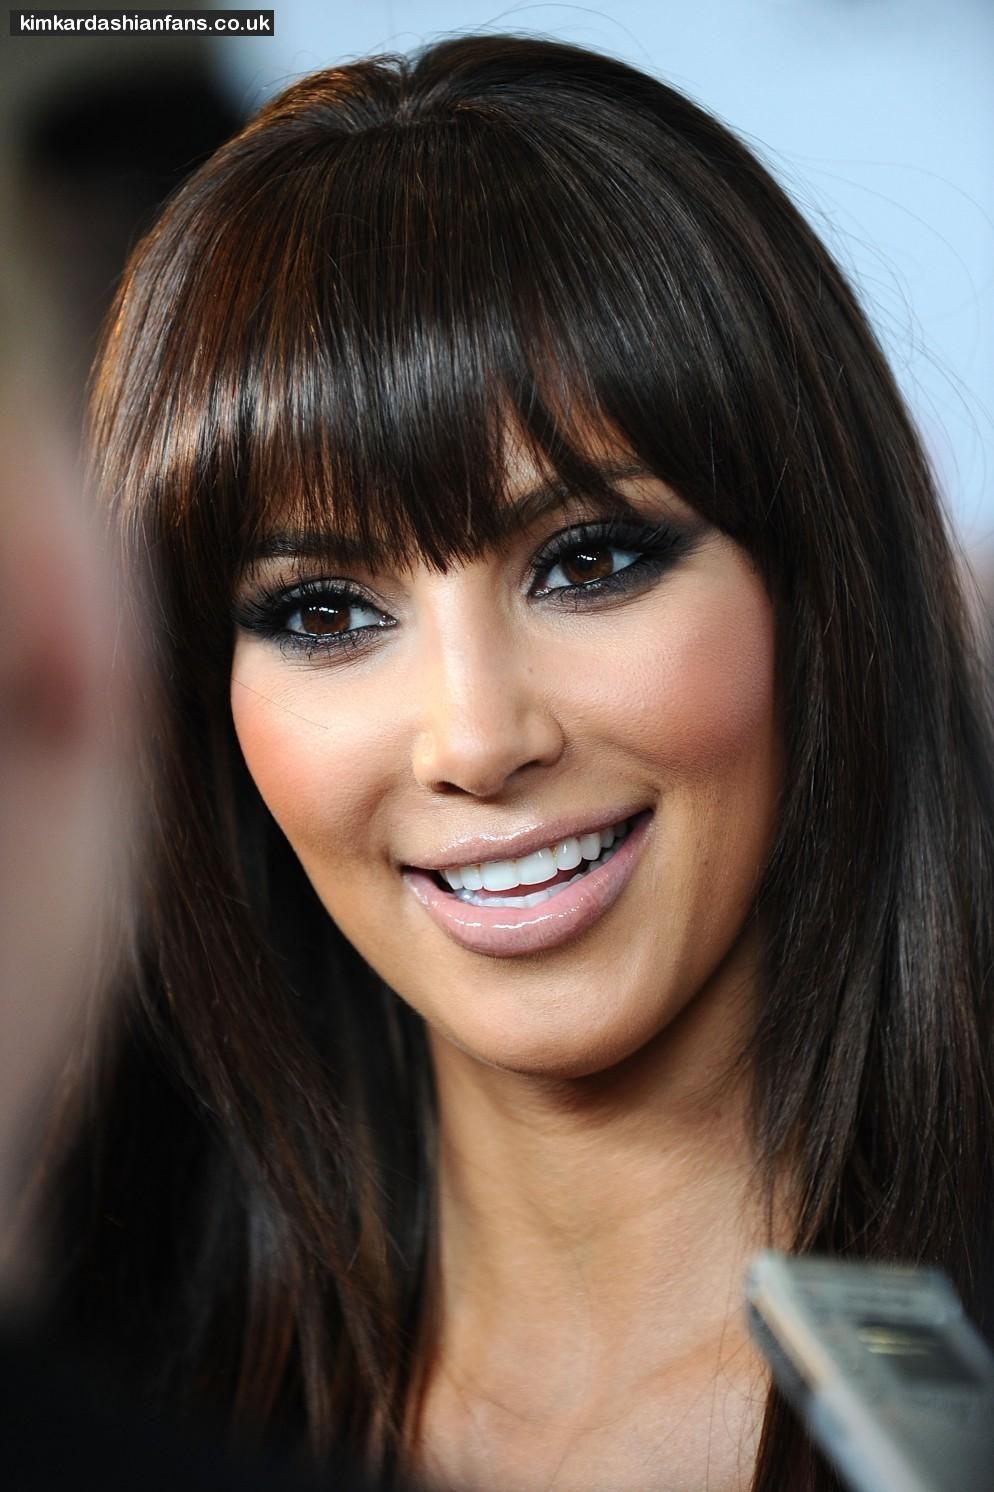 Watch Kim Kardashian flashing pics. 2018-2019 celebrityes photos leaks! video